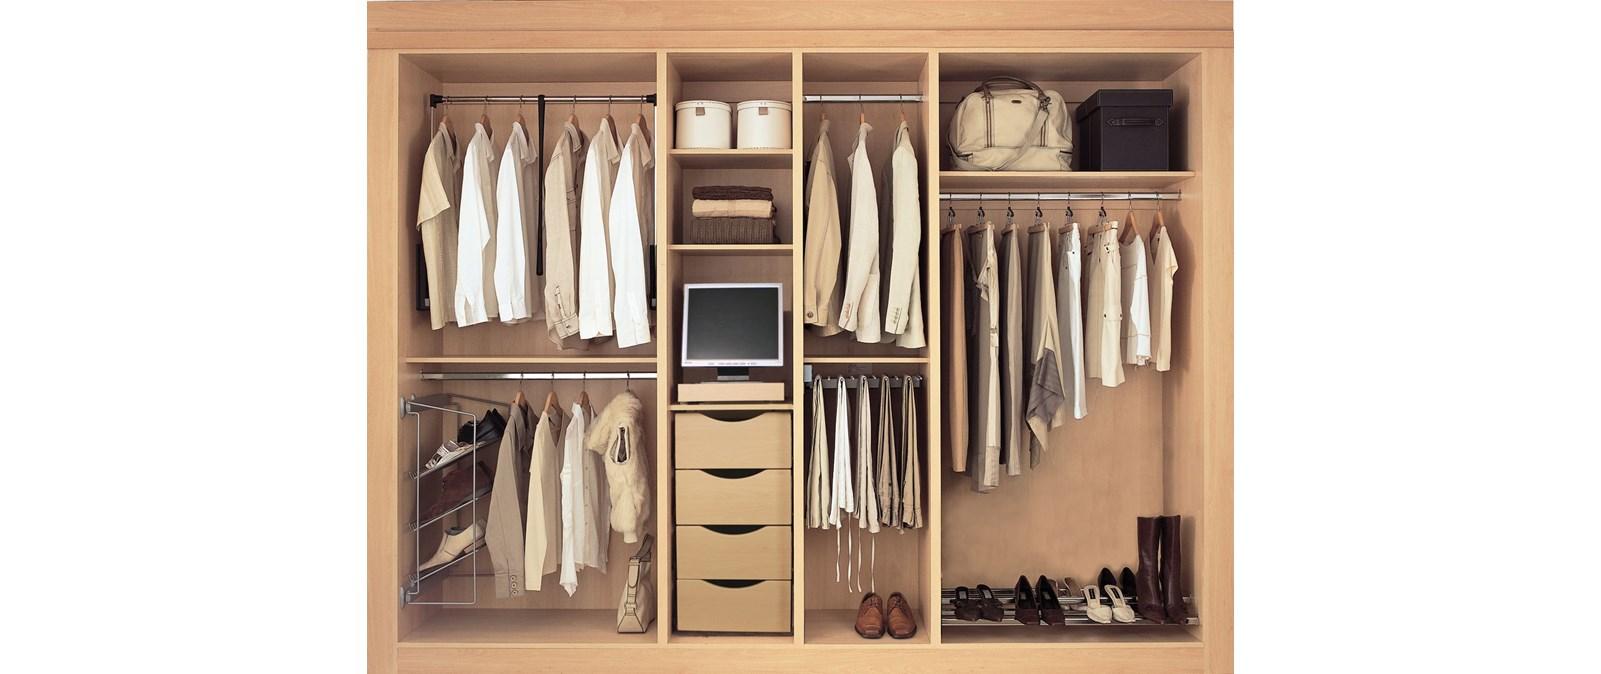 11 tips για να οργανώσεις τη ντουλάπα σου όπως οι επαγγελματίες 9e7a24a7d20